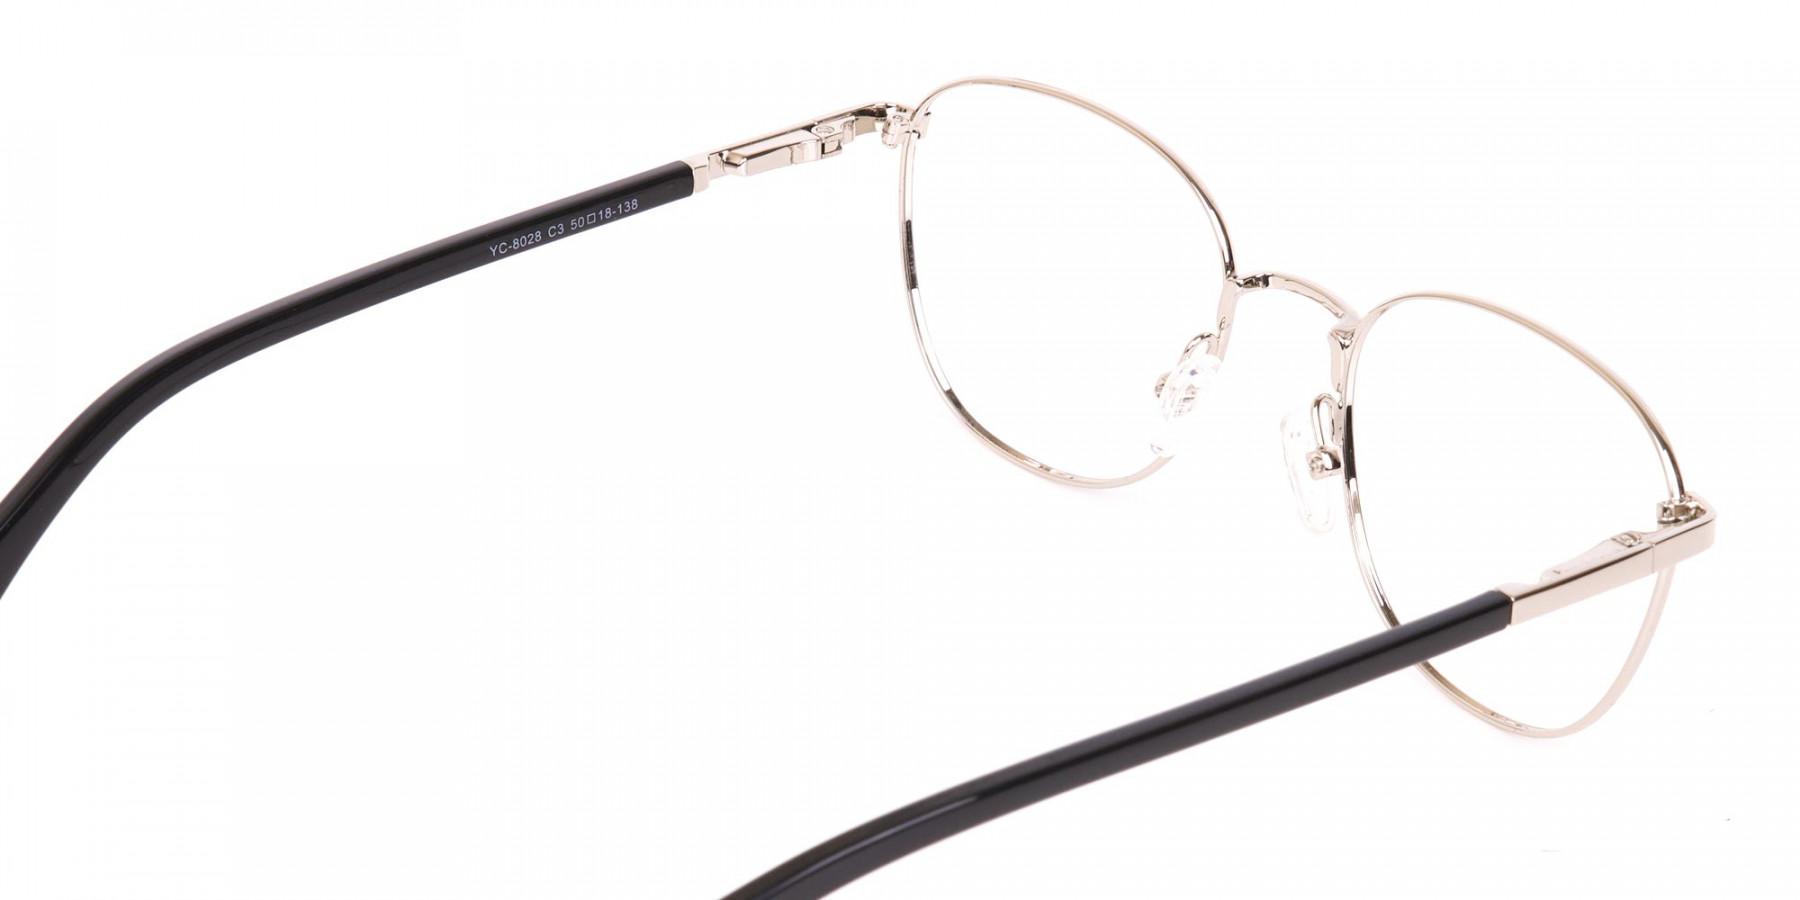 Silver Retro Wayfarer Nerd Glasses Online-1